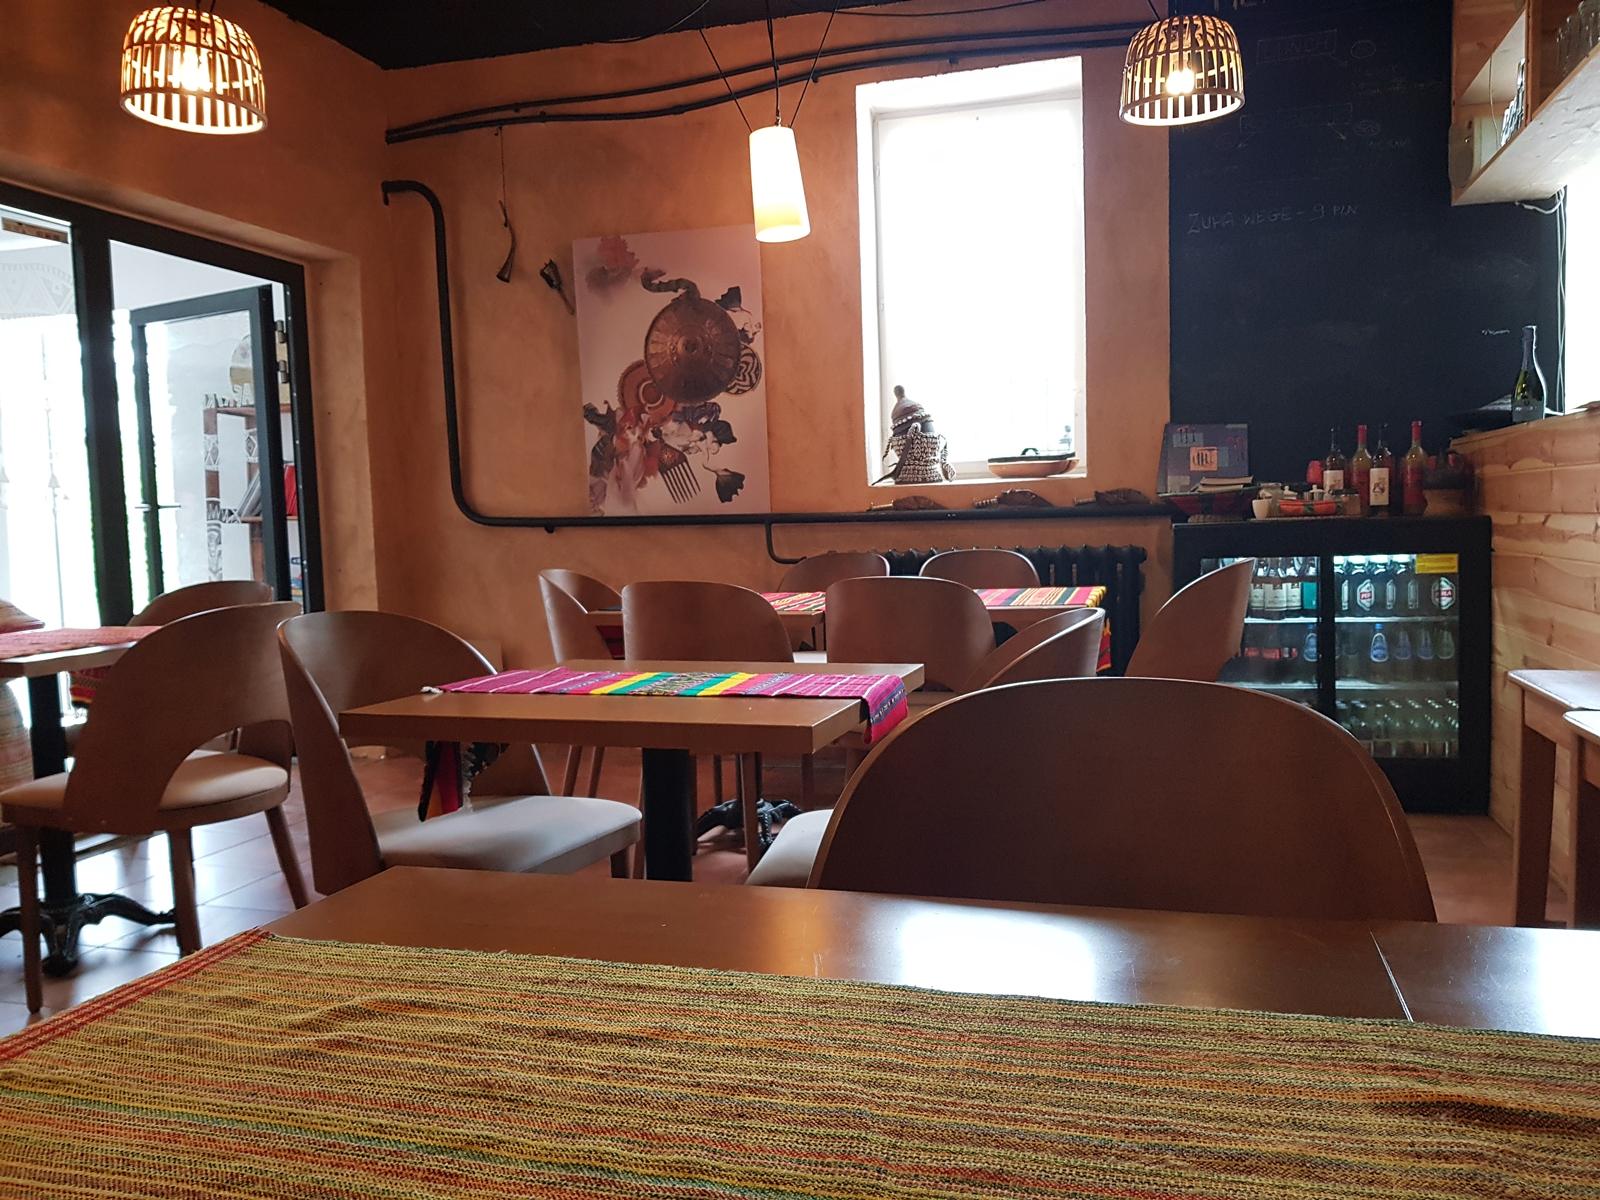 restauracja afrykasy